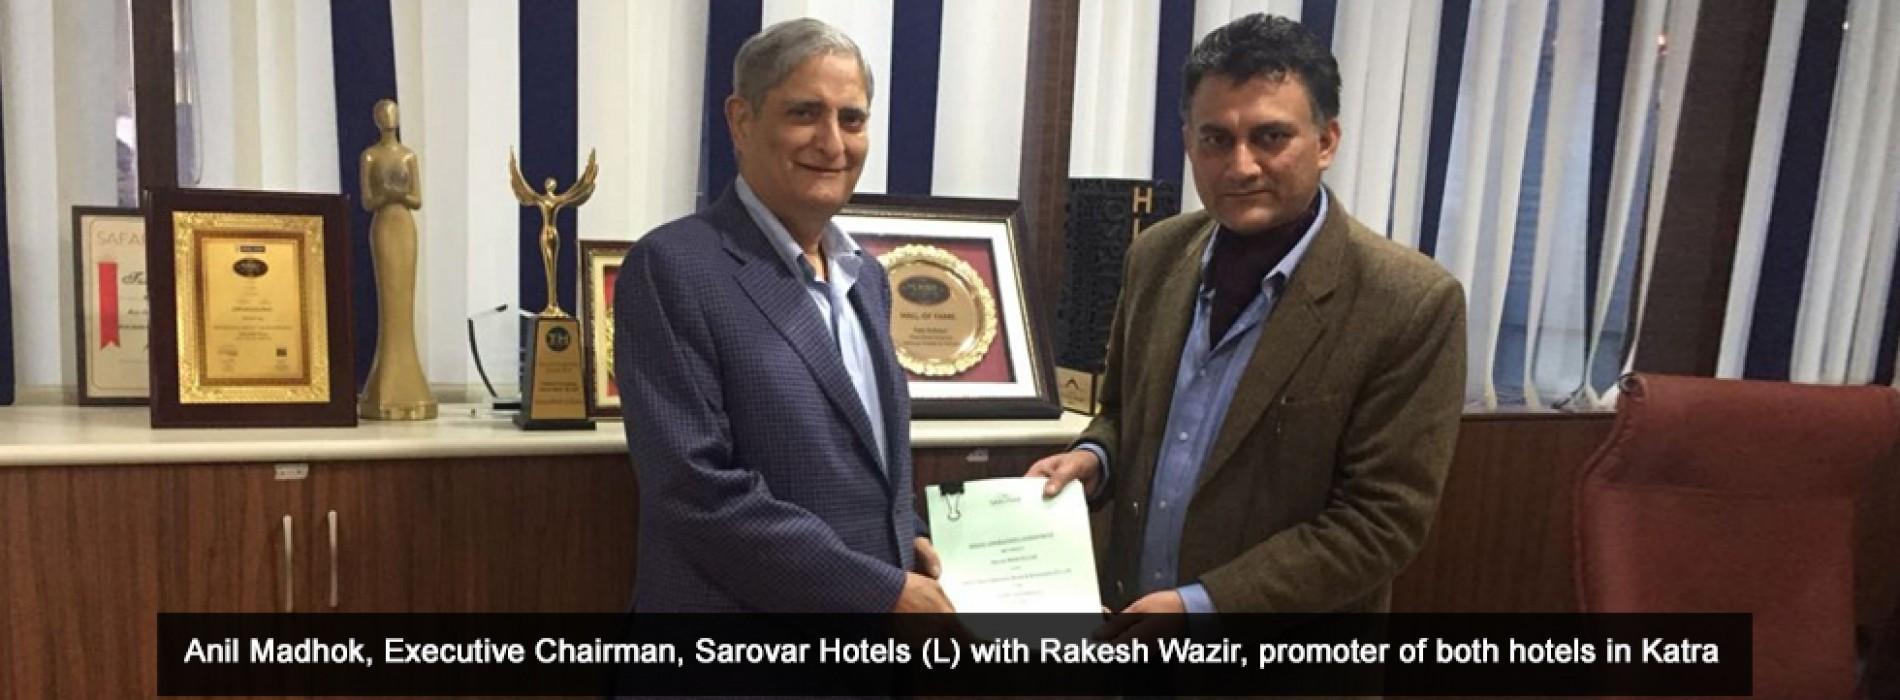 Sarovar Hotels adds another pilgrimage destination to its portfolio